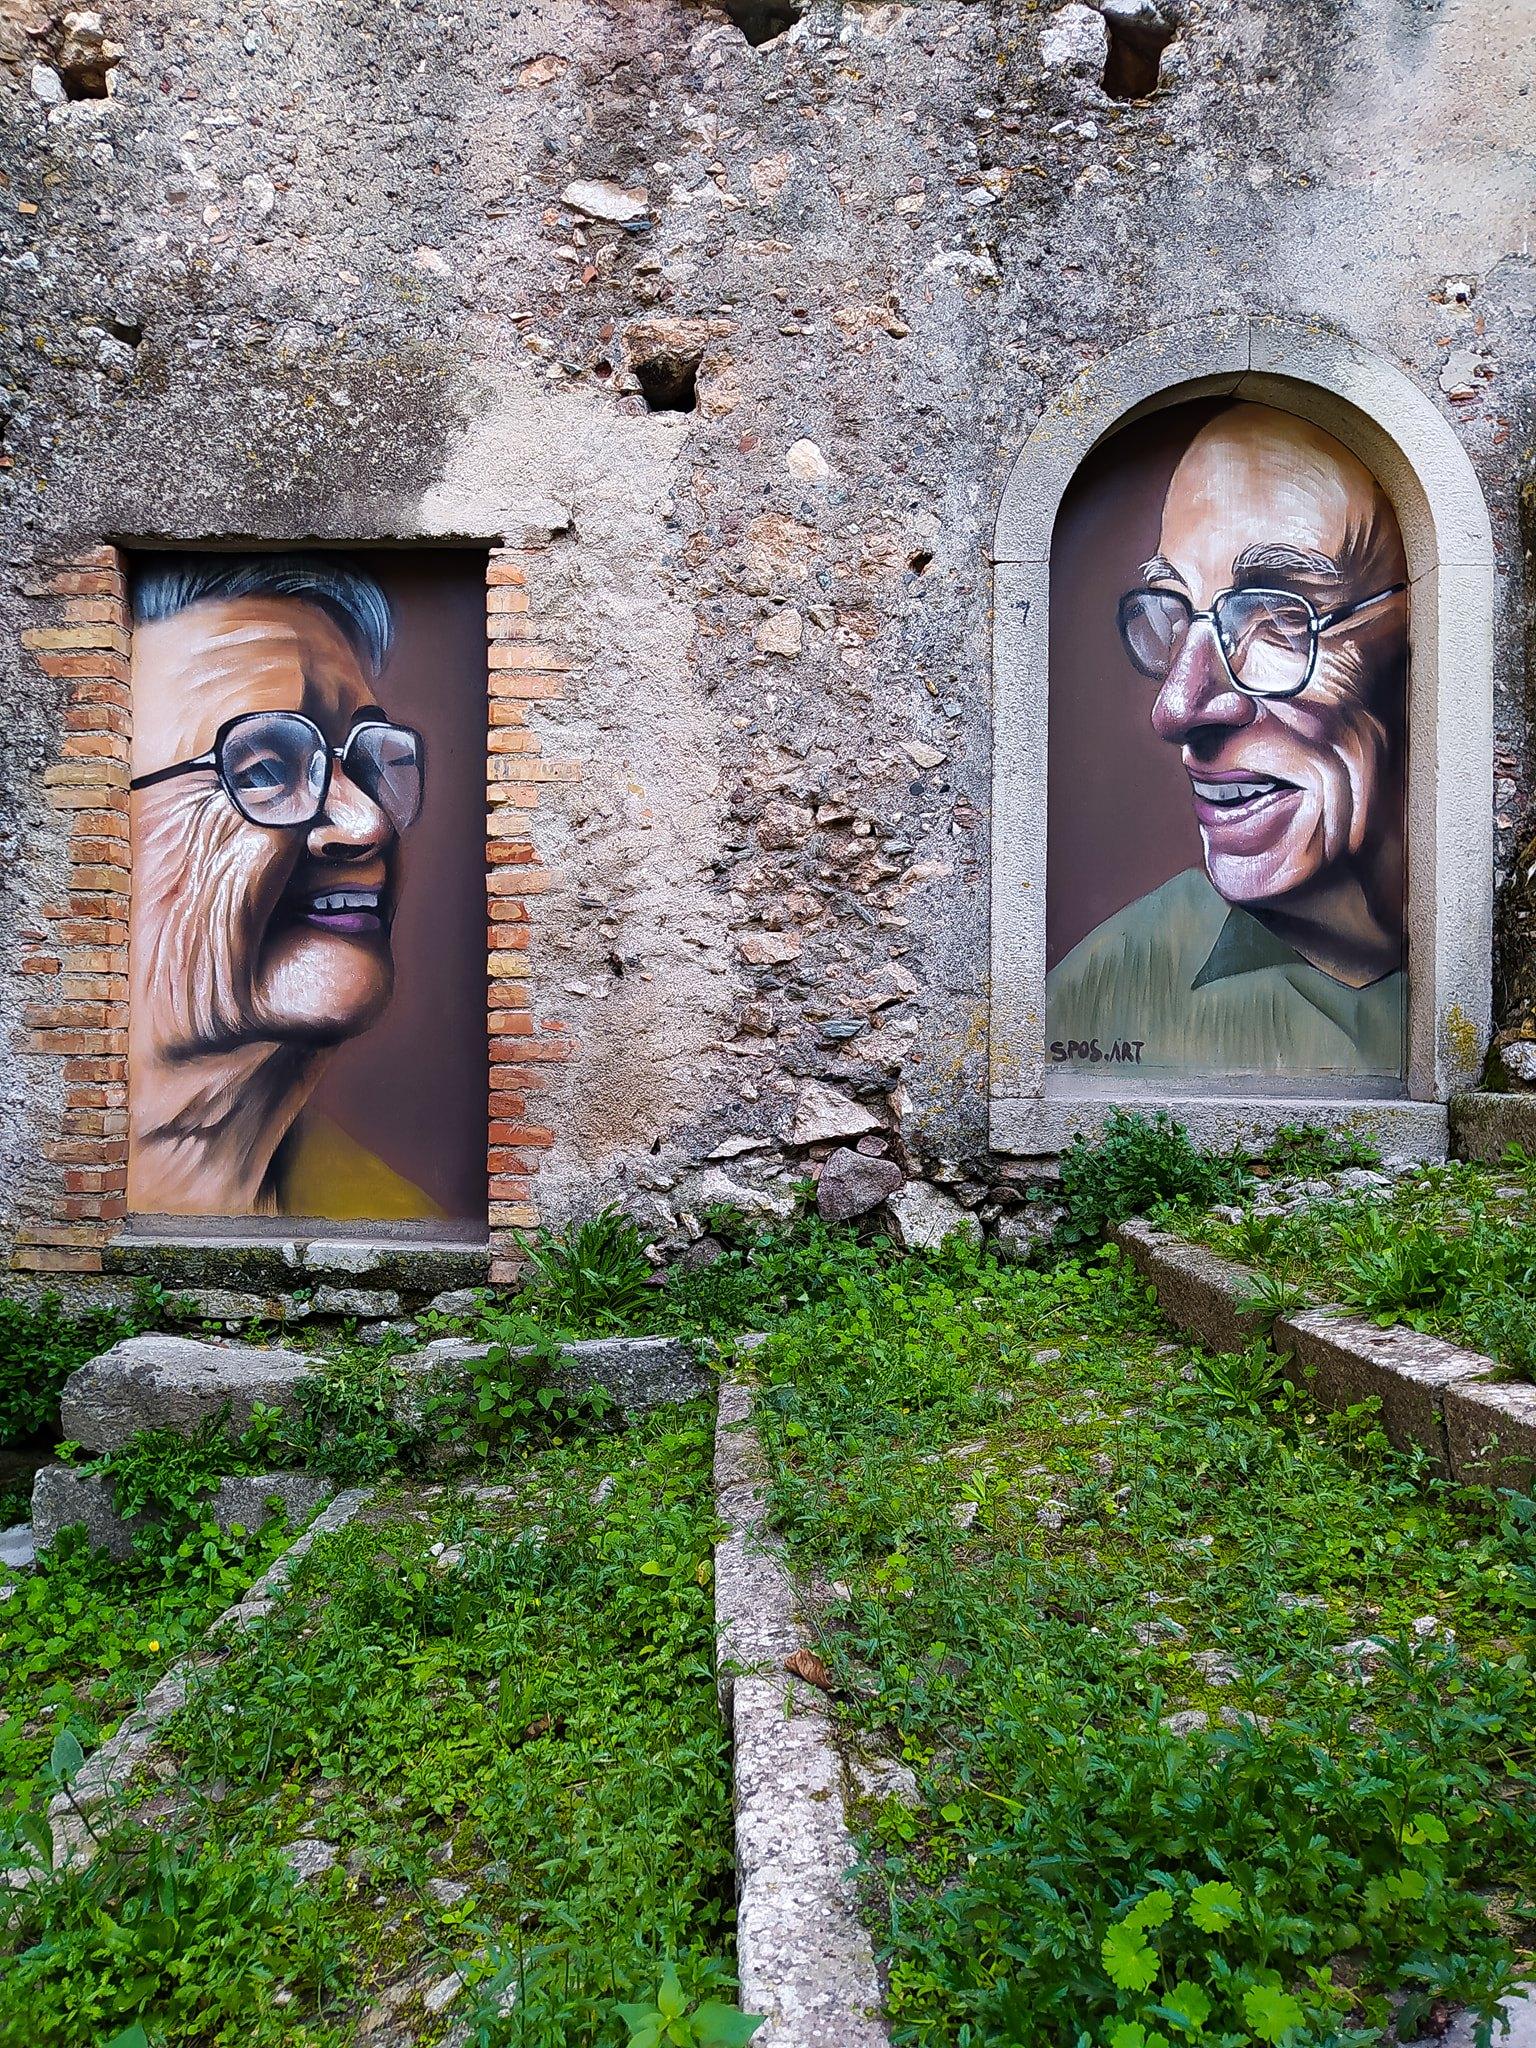 Le storie di ieri - Novara di Sicilia